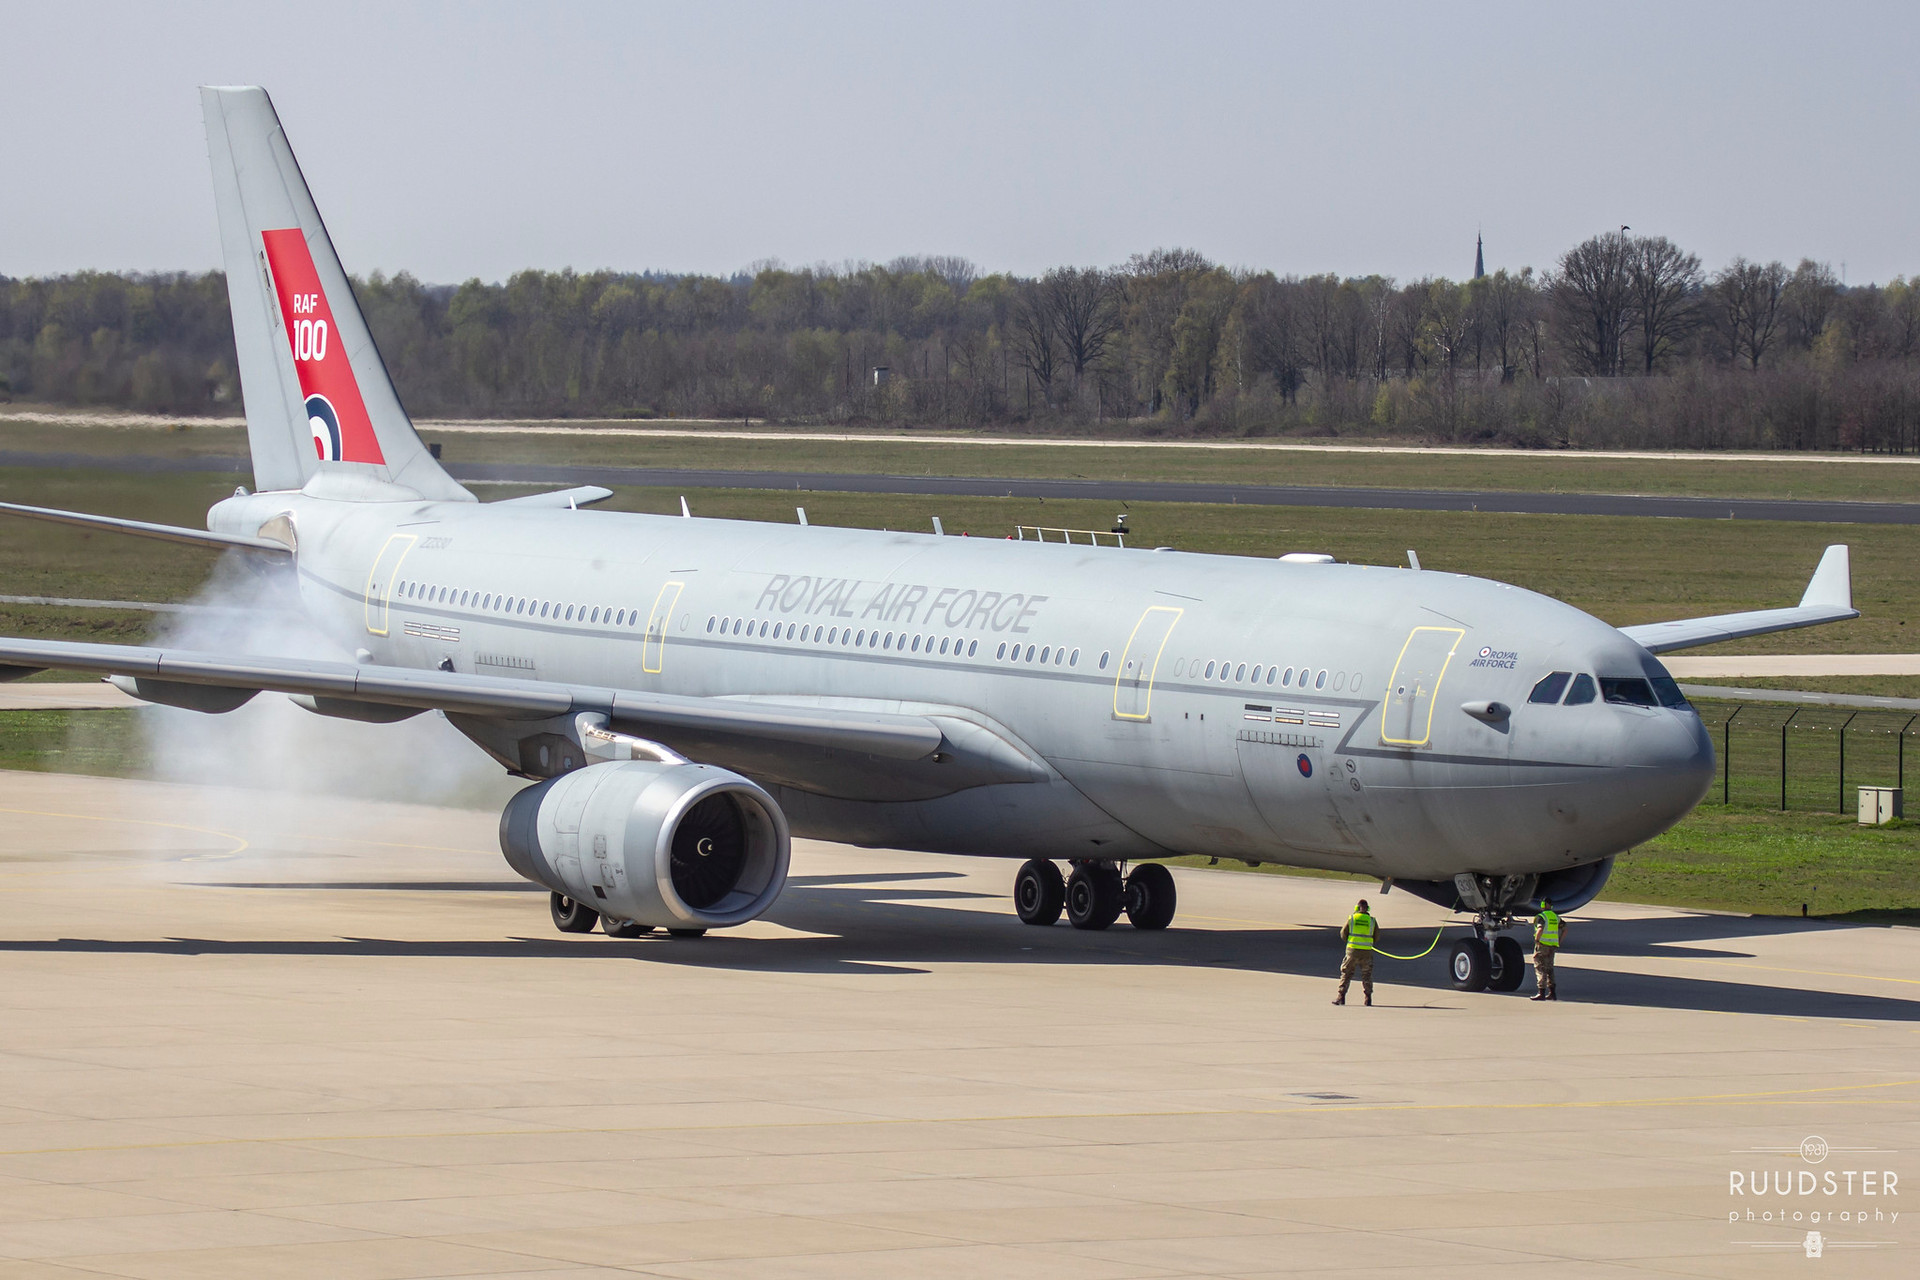 ZZ330   Build: 2012 - Airbus A330-200 MRTT